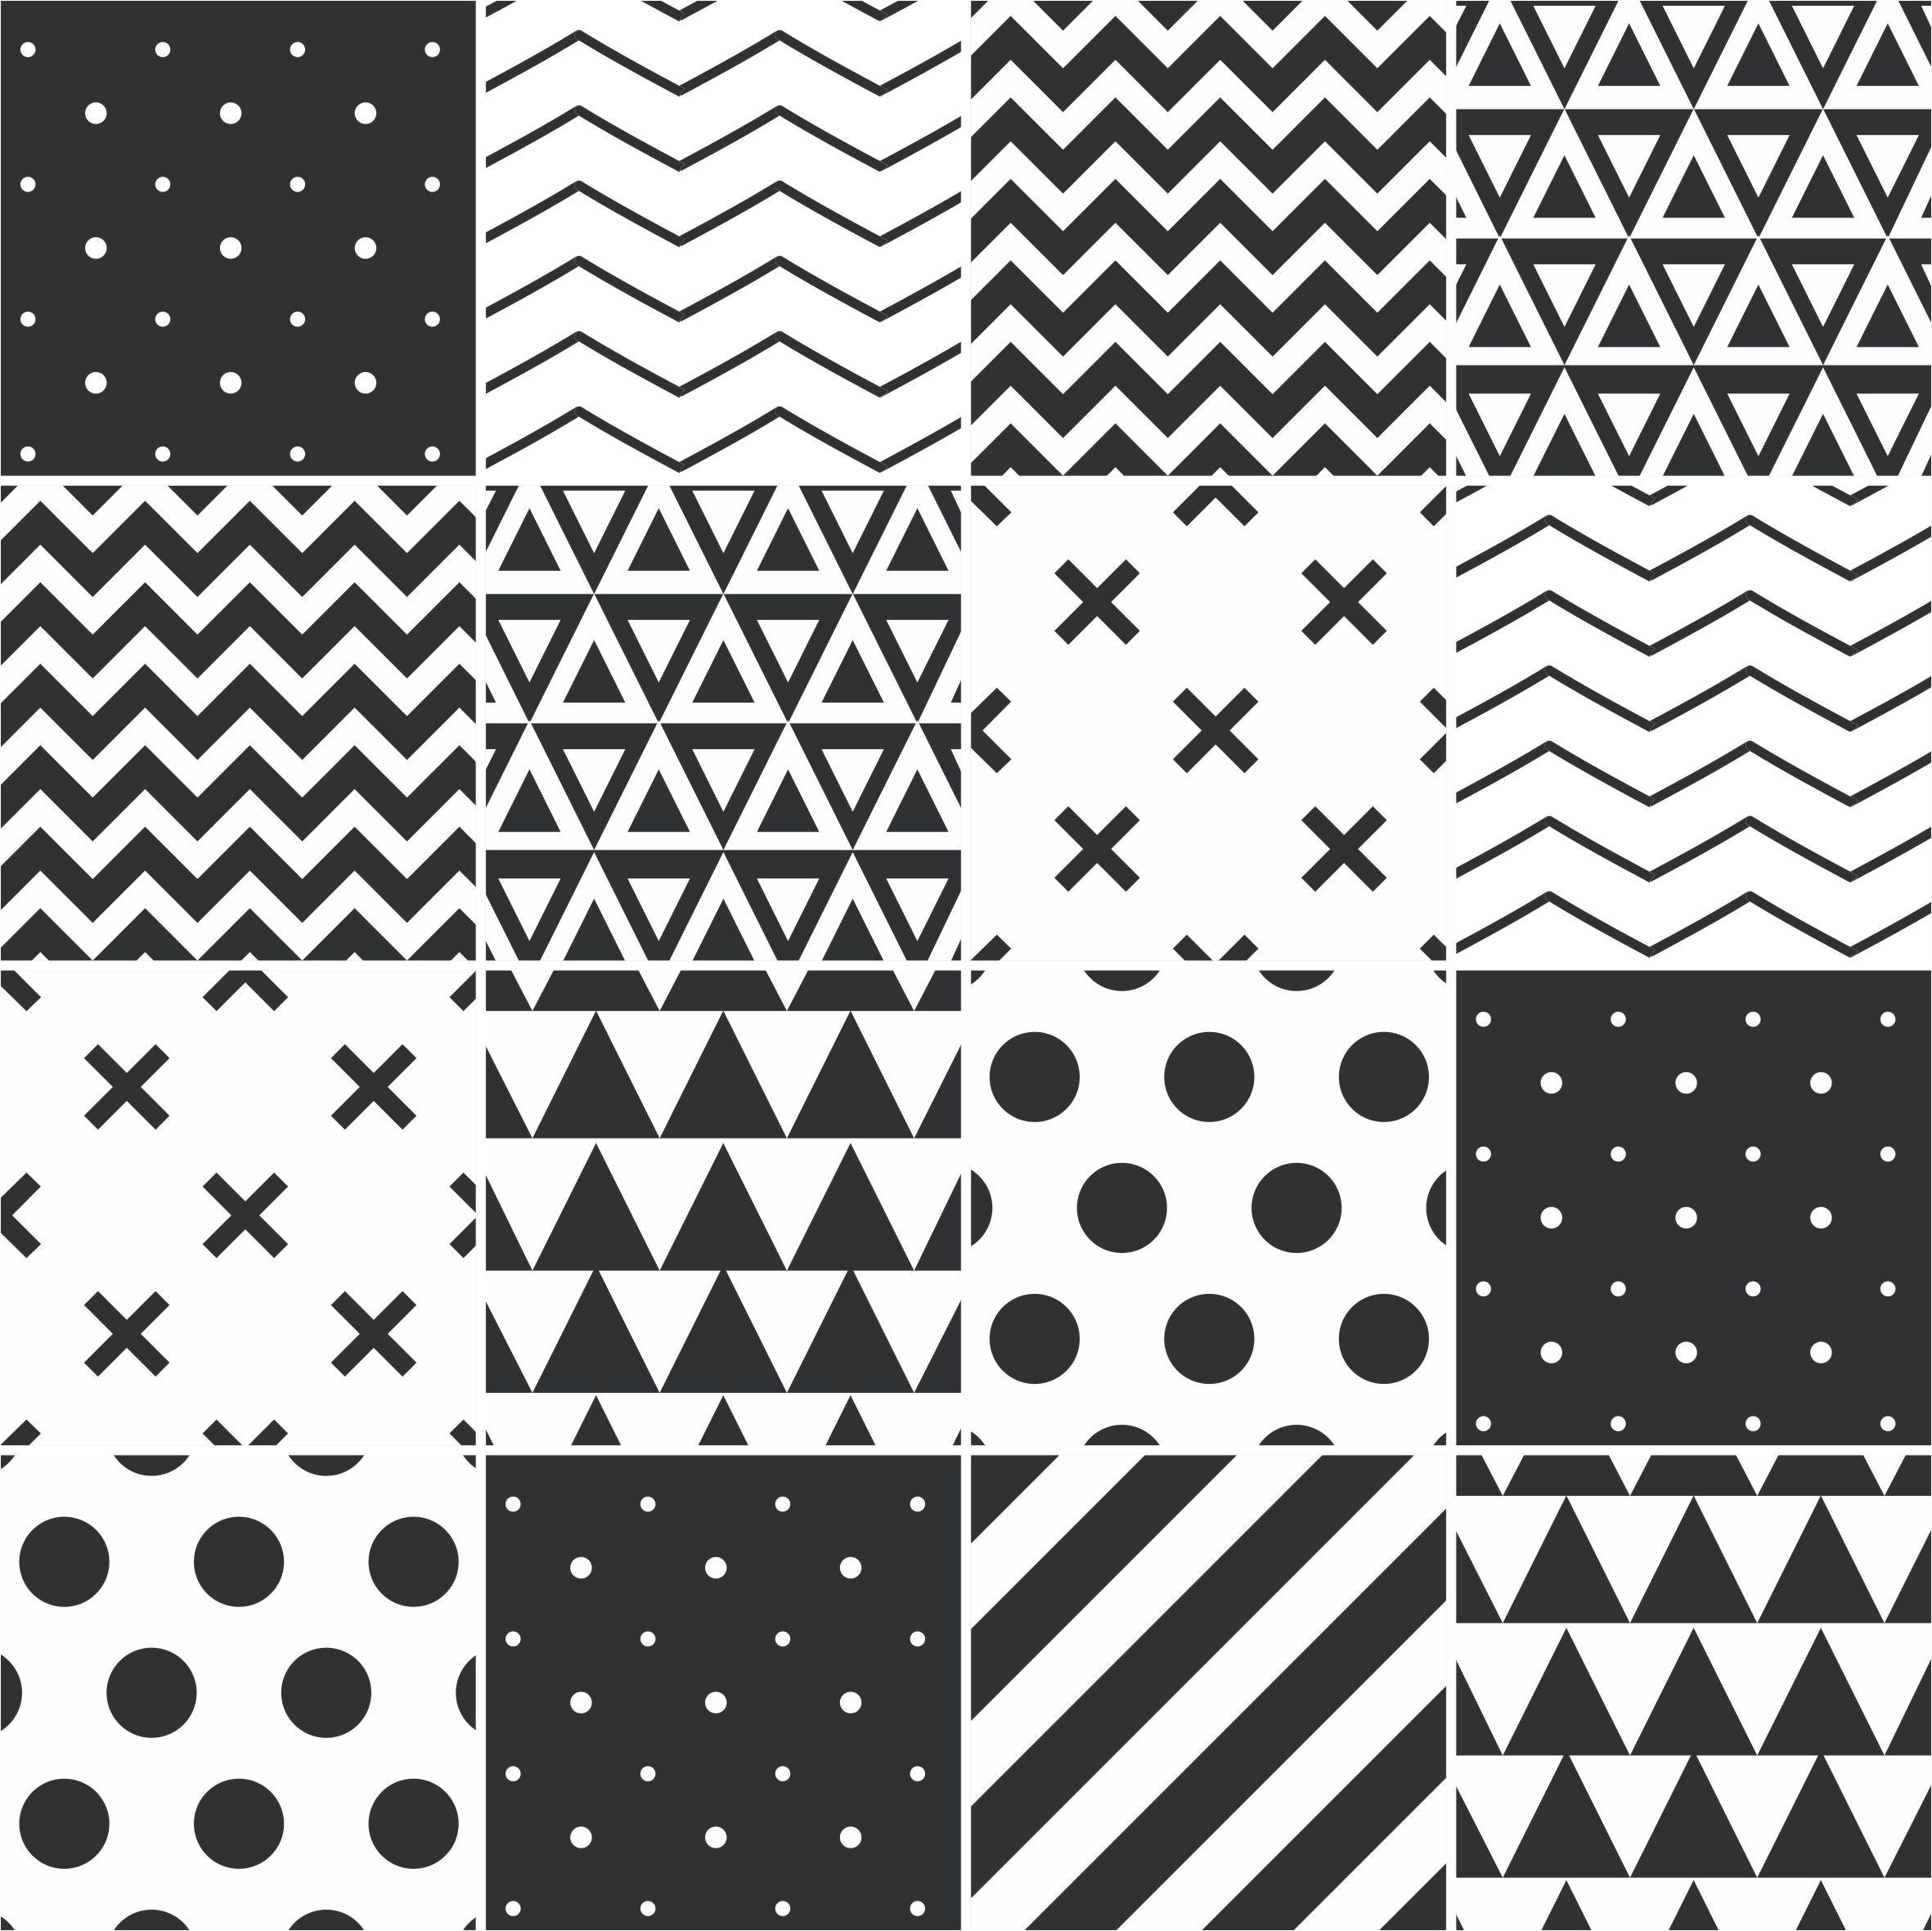 Black Dot Wallpaper Papel De Parede Adesivo Azulejo Formas Preto E Branco